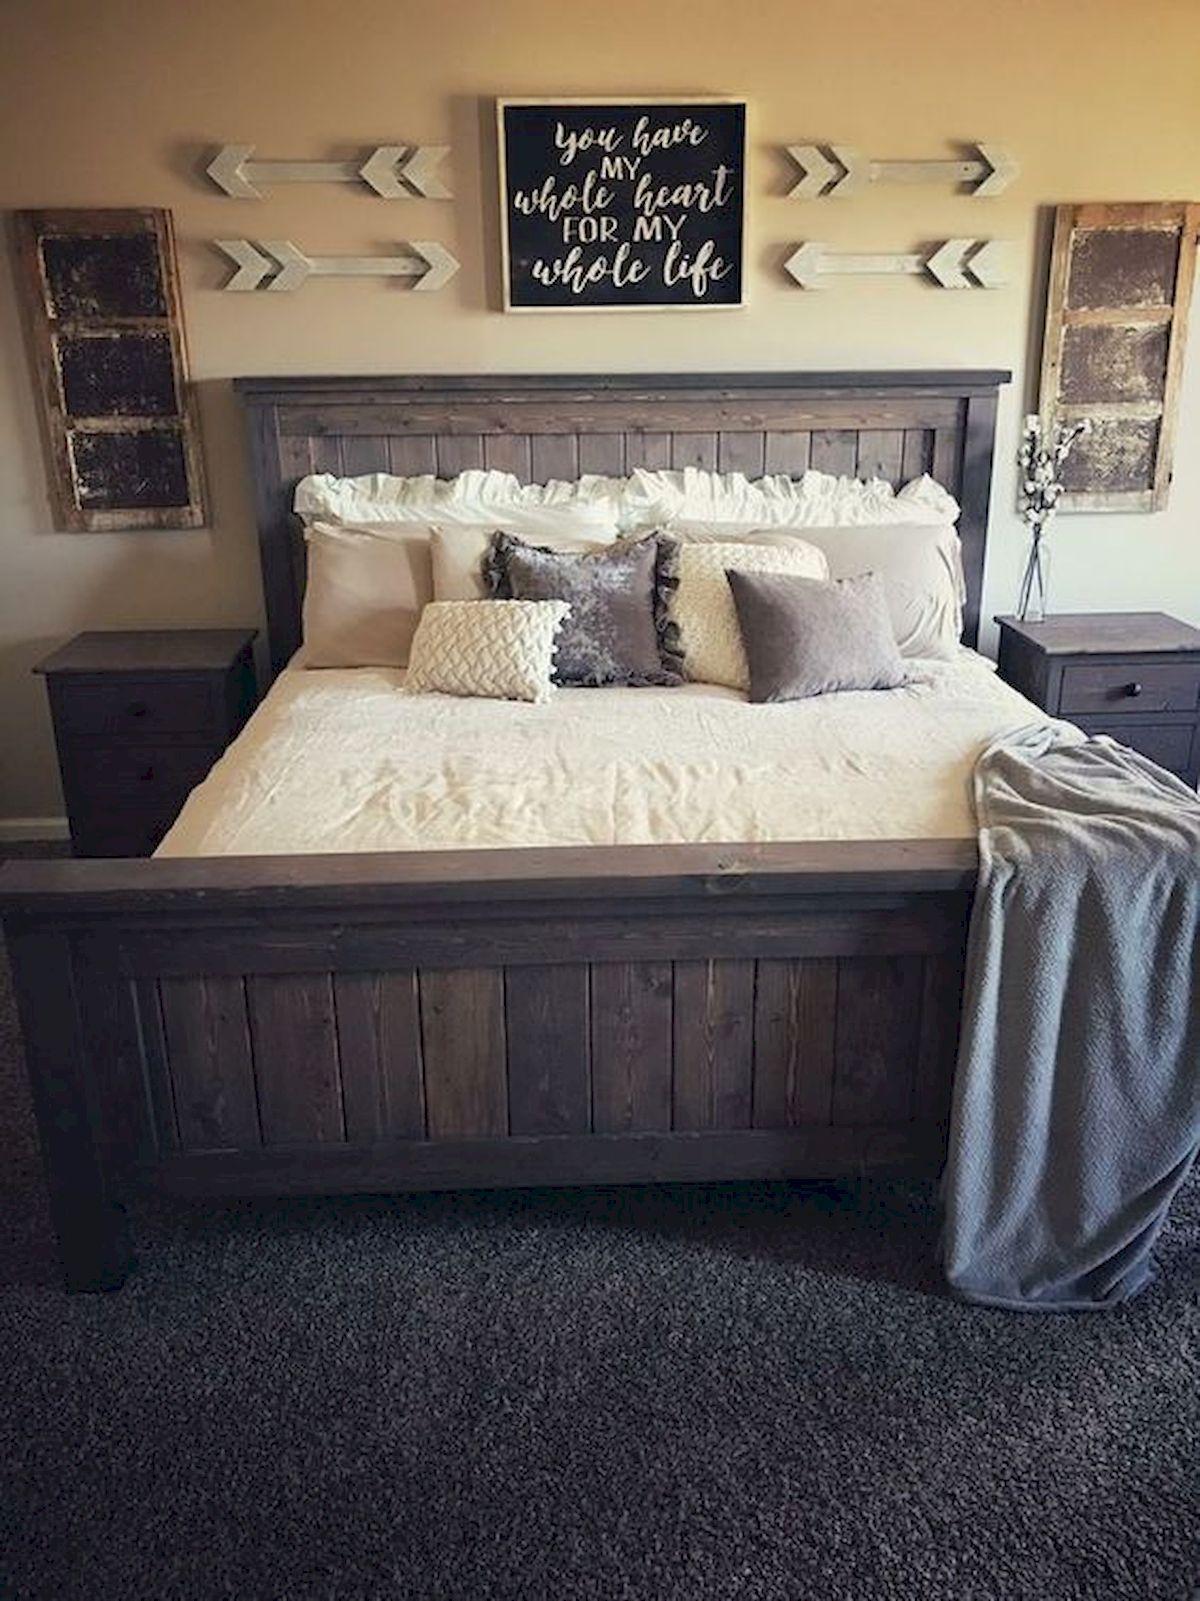 55 romantic bedroom decor for couple 7 house8055 com on romantic trend master bedroom ideas id=65748